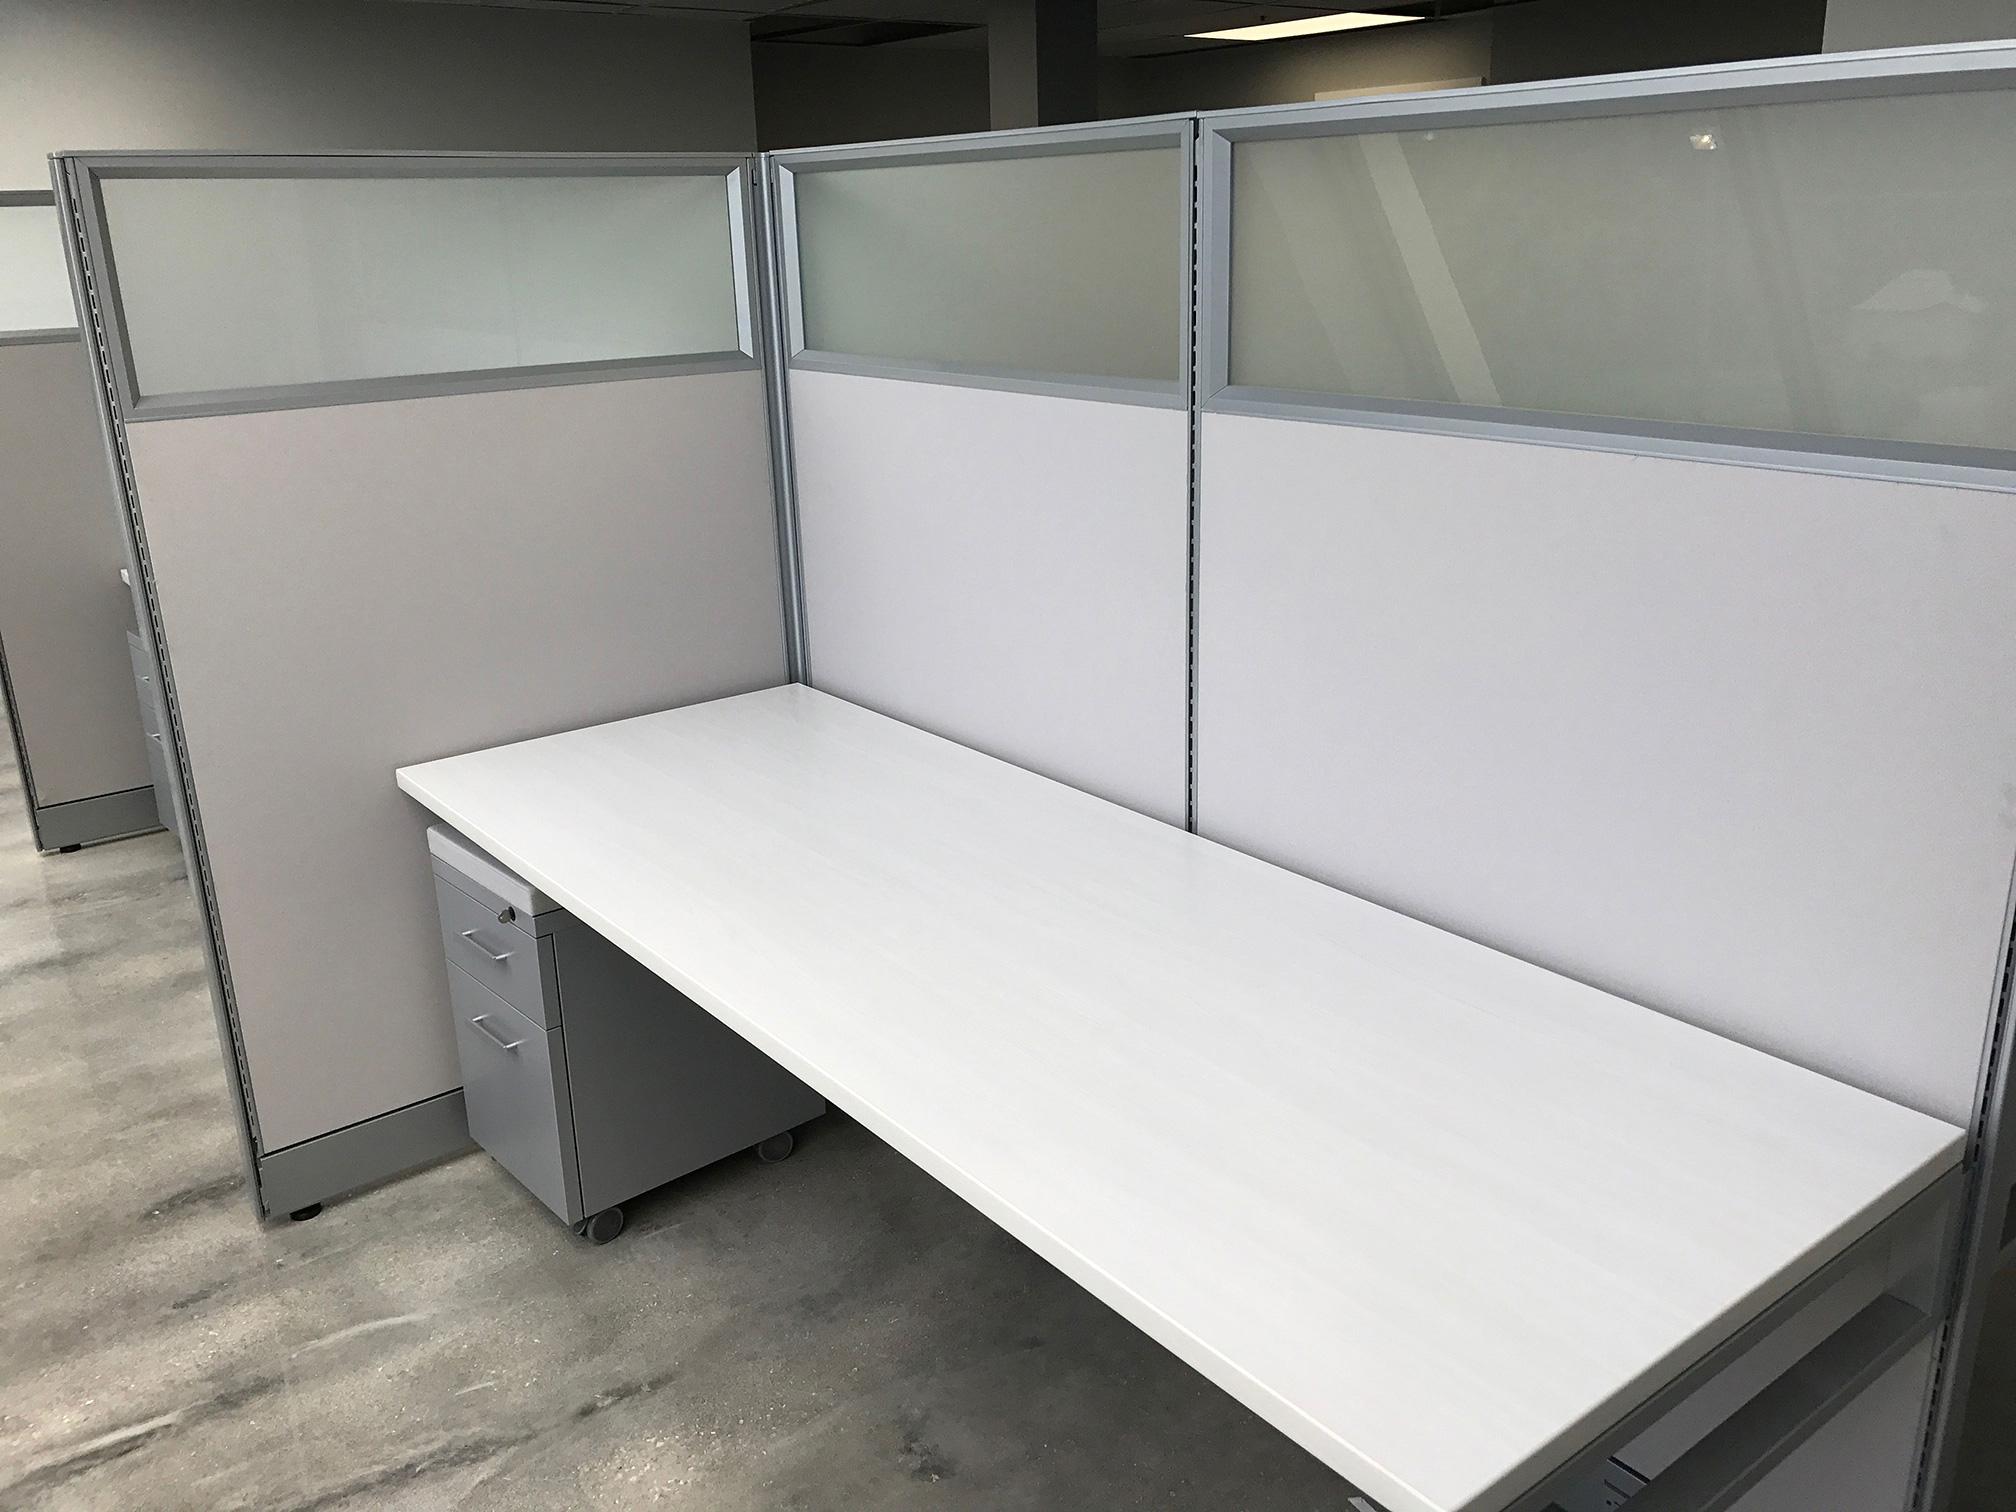 office-cubicles-for-sale-in-seaside-florida-3.jpg